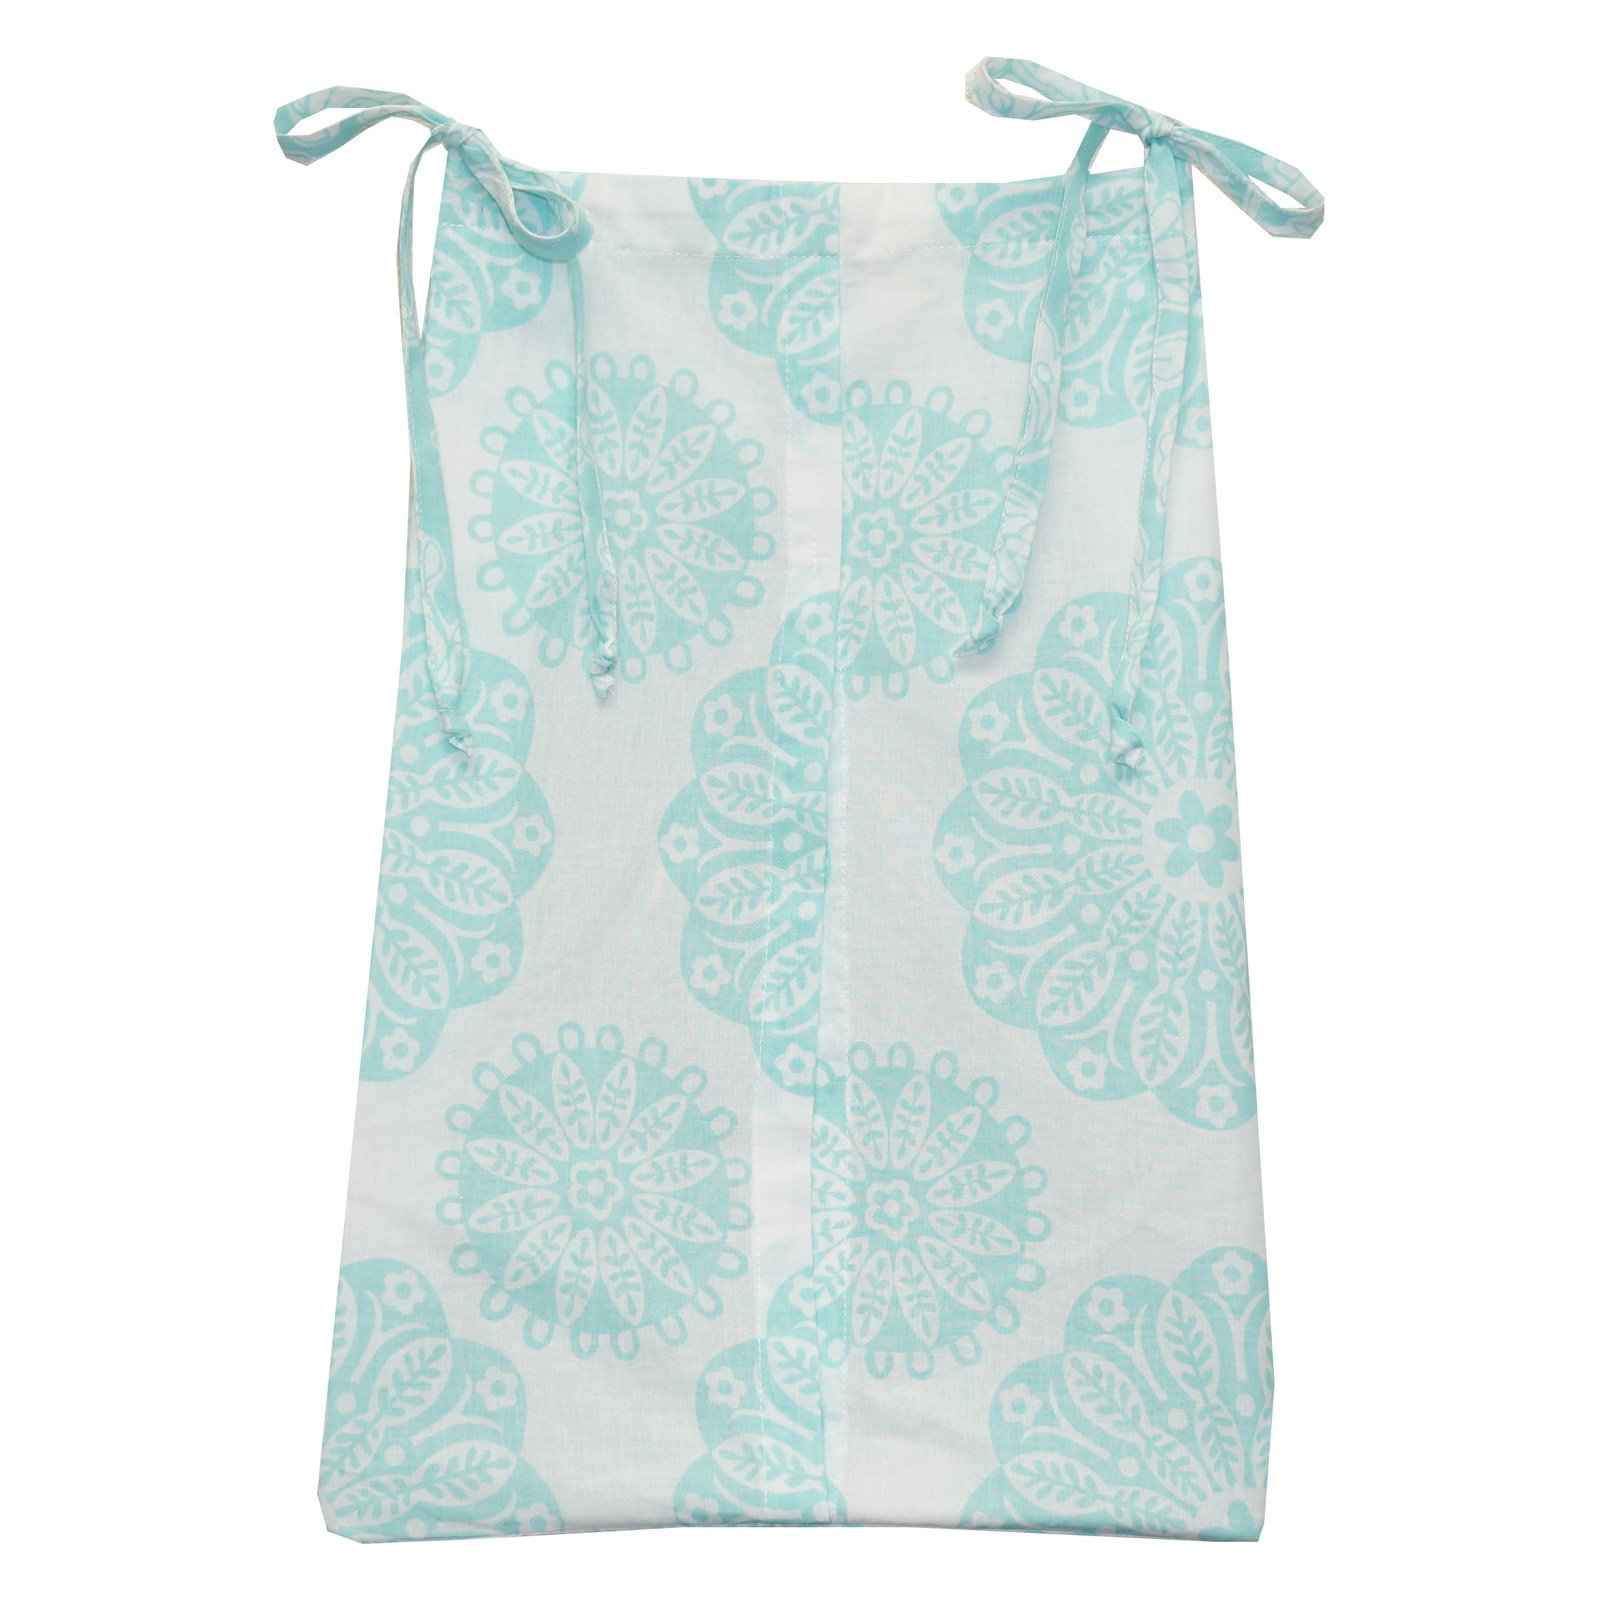 Sweet & Simple Aqua Blue Diaper Stacker by Cotton Tale Designs by Cotton Tale Designs